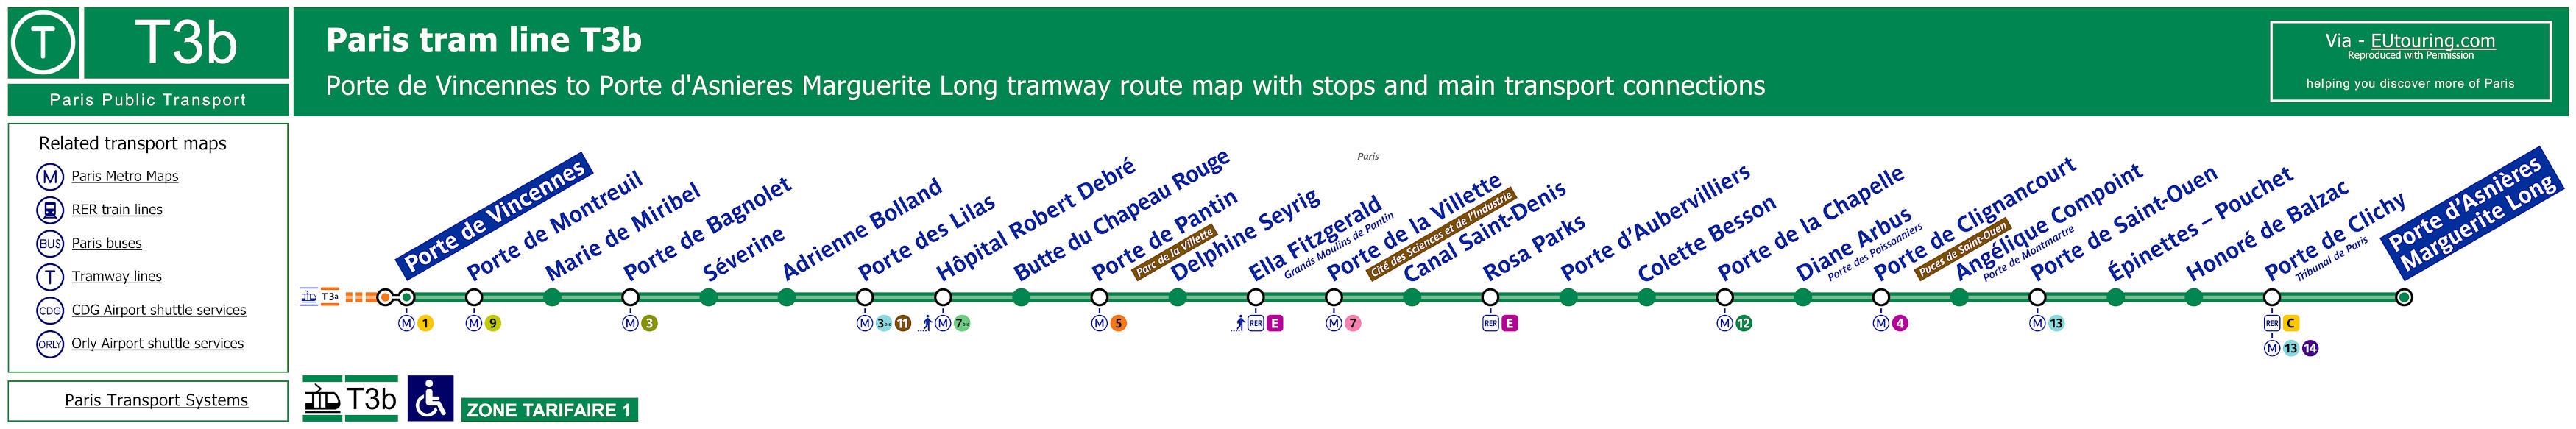 paris metro map pdf with Paris Tram Maps on Mapas De Metro Tranvia Y Bus Para Europa En Pdf also 227796 together with Piste Cyclable Paris further Paris together with Plan Gratuit Paris Pdf.